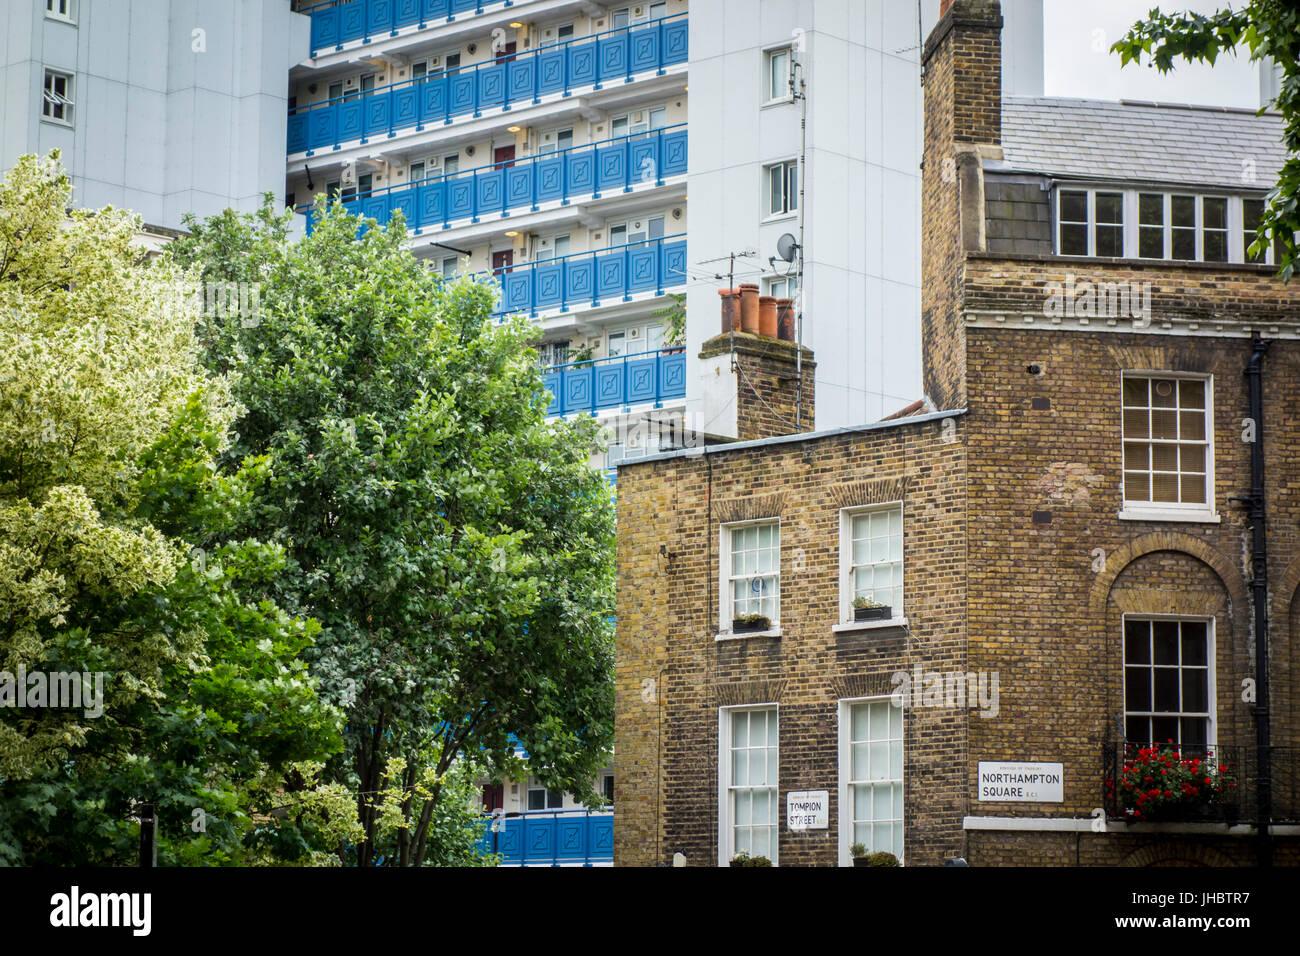 Contrast of Gerorgian housing with social housing tower block behind. Northampton Square, Clerkenwell, London, UK - Stock Image